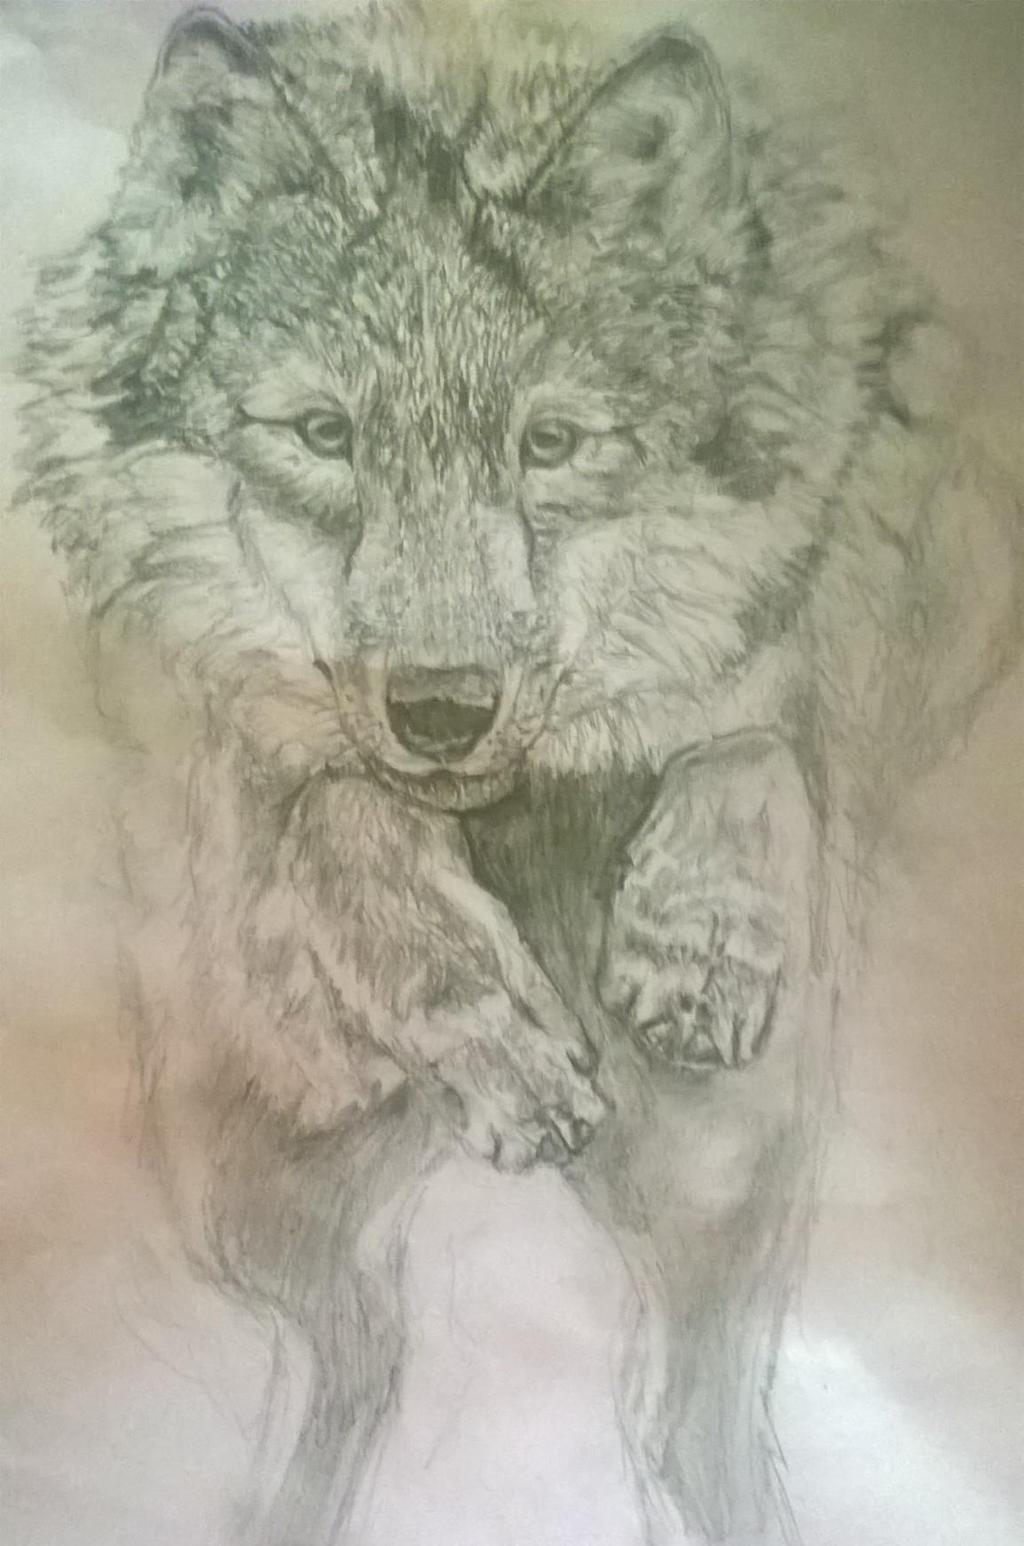 Wolf 2 by ChocoBookworm